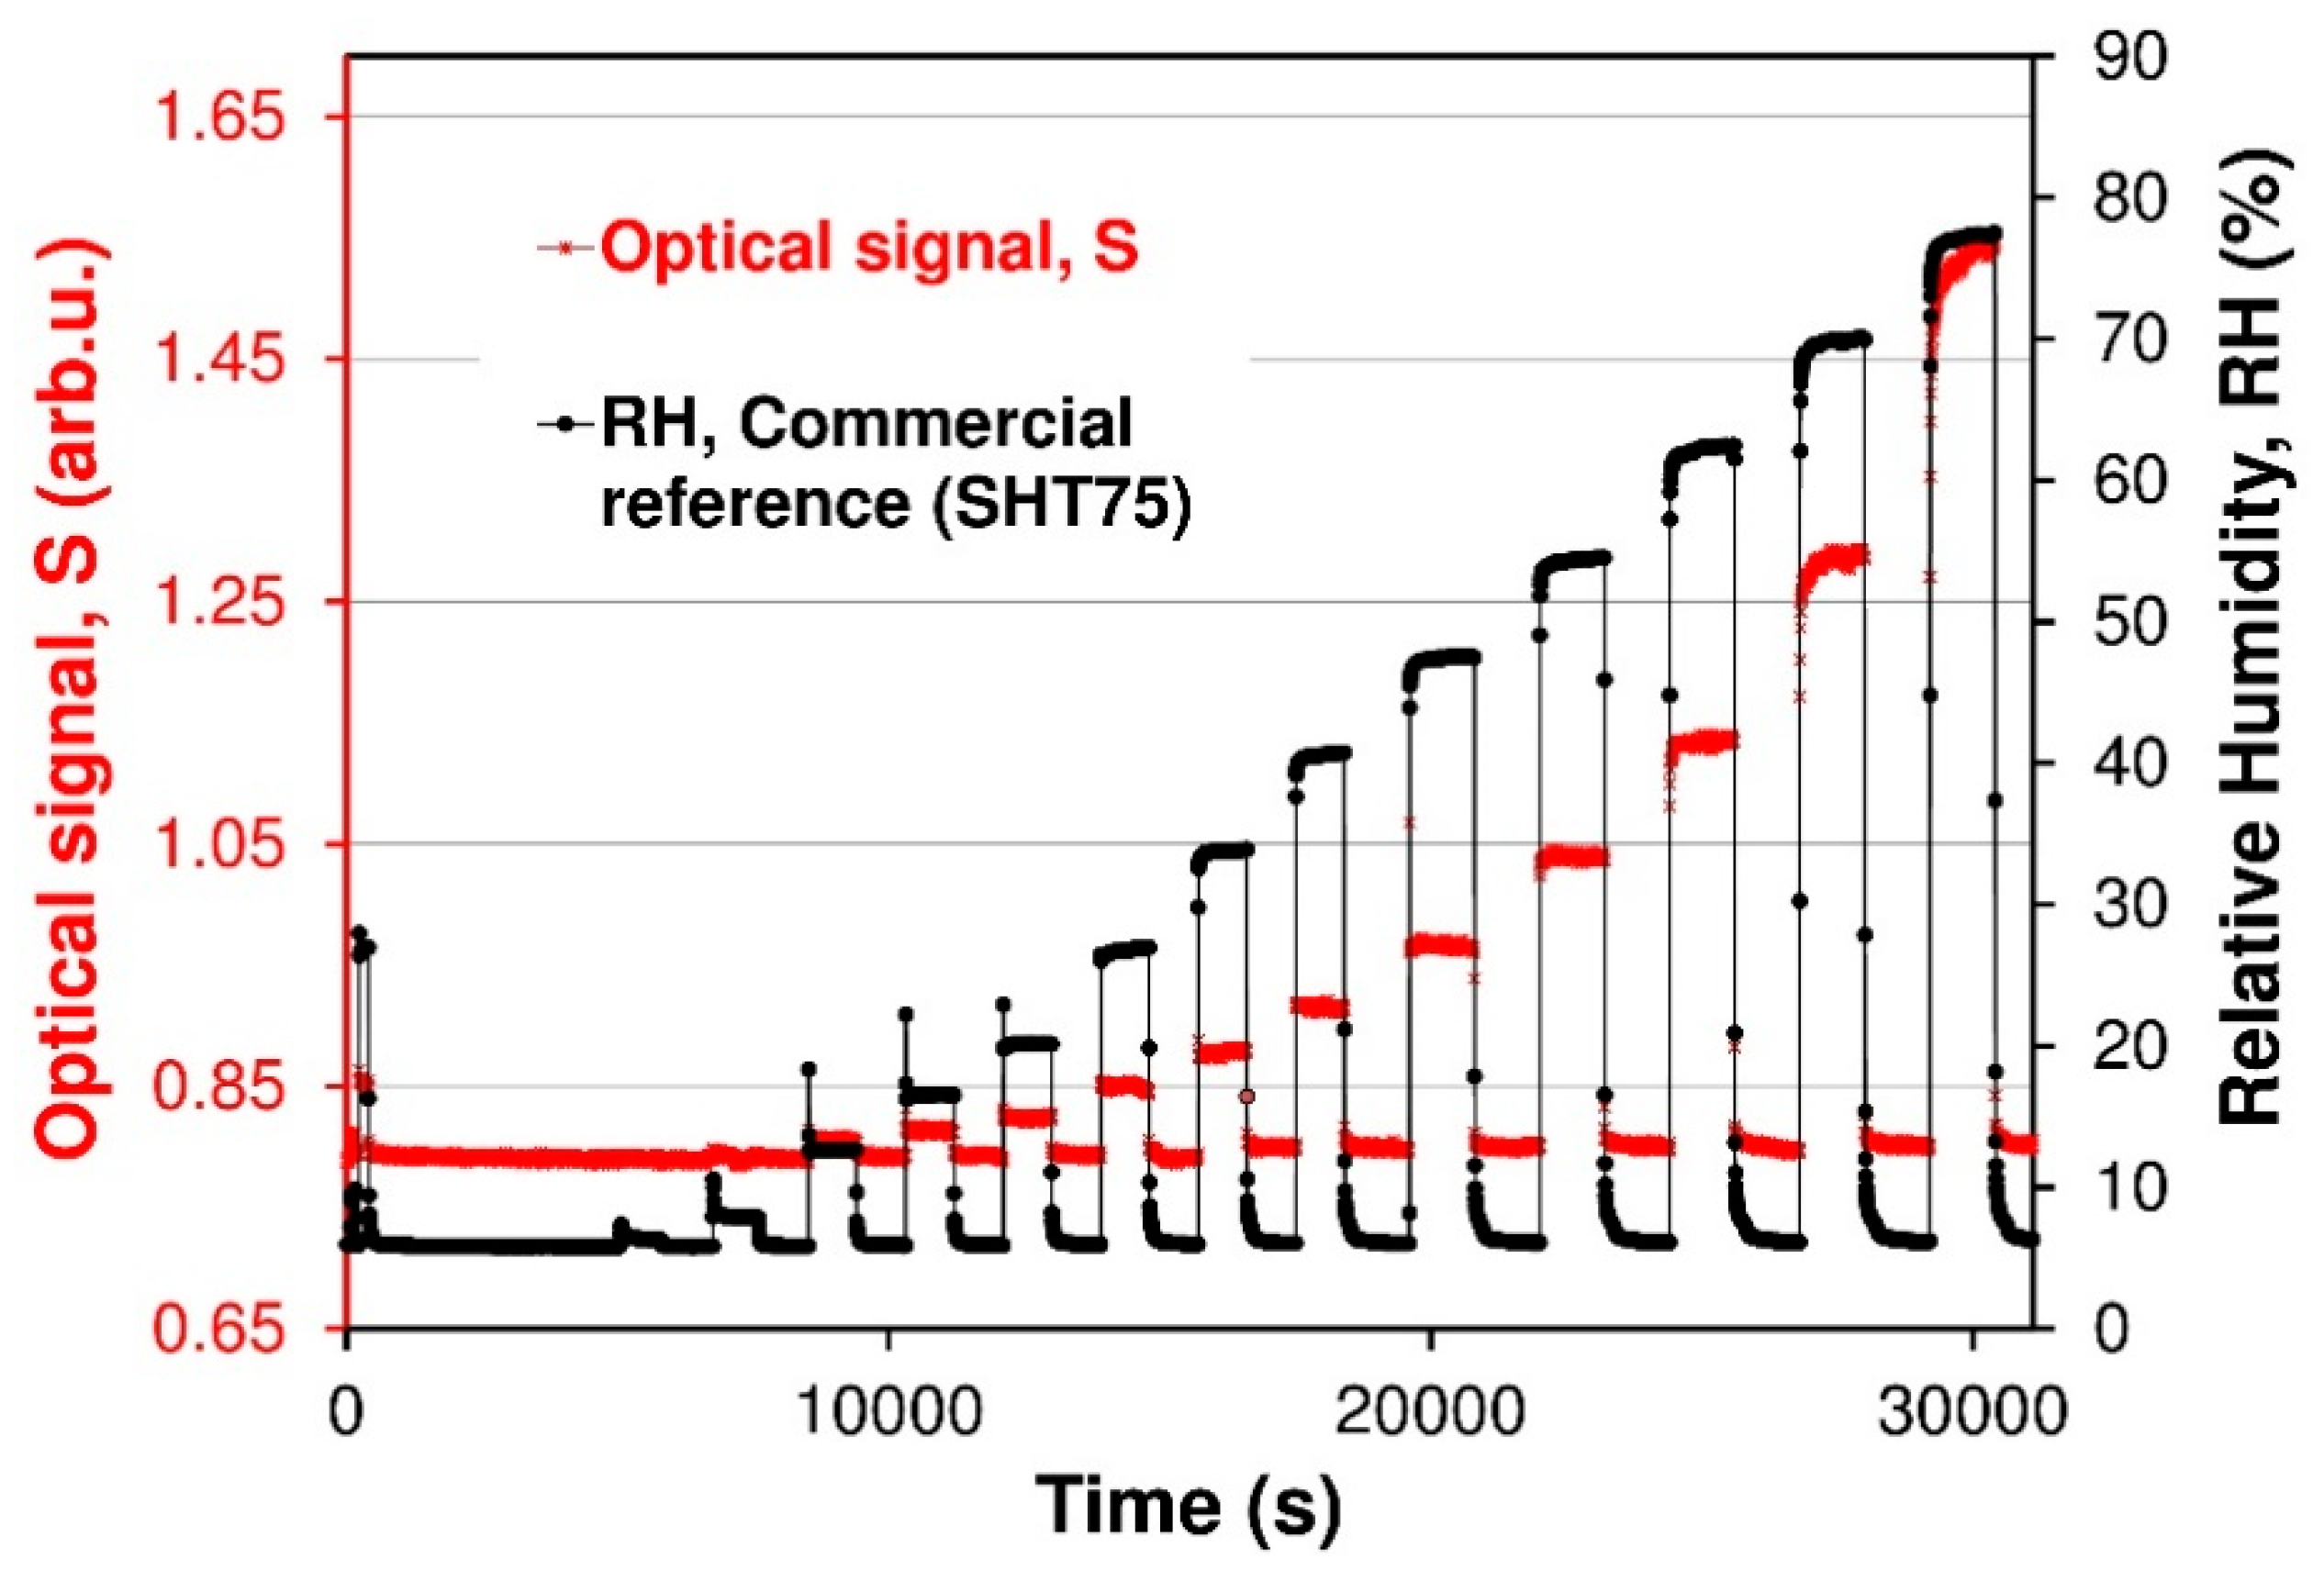 figure 1 optical switches optical sensors figure 1a shows a